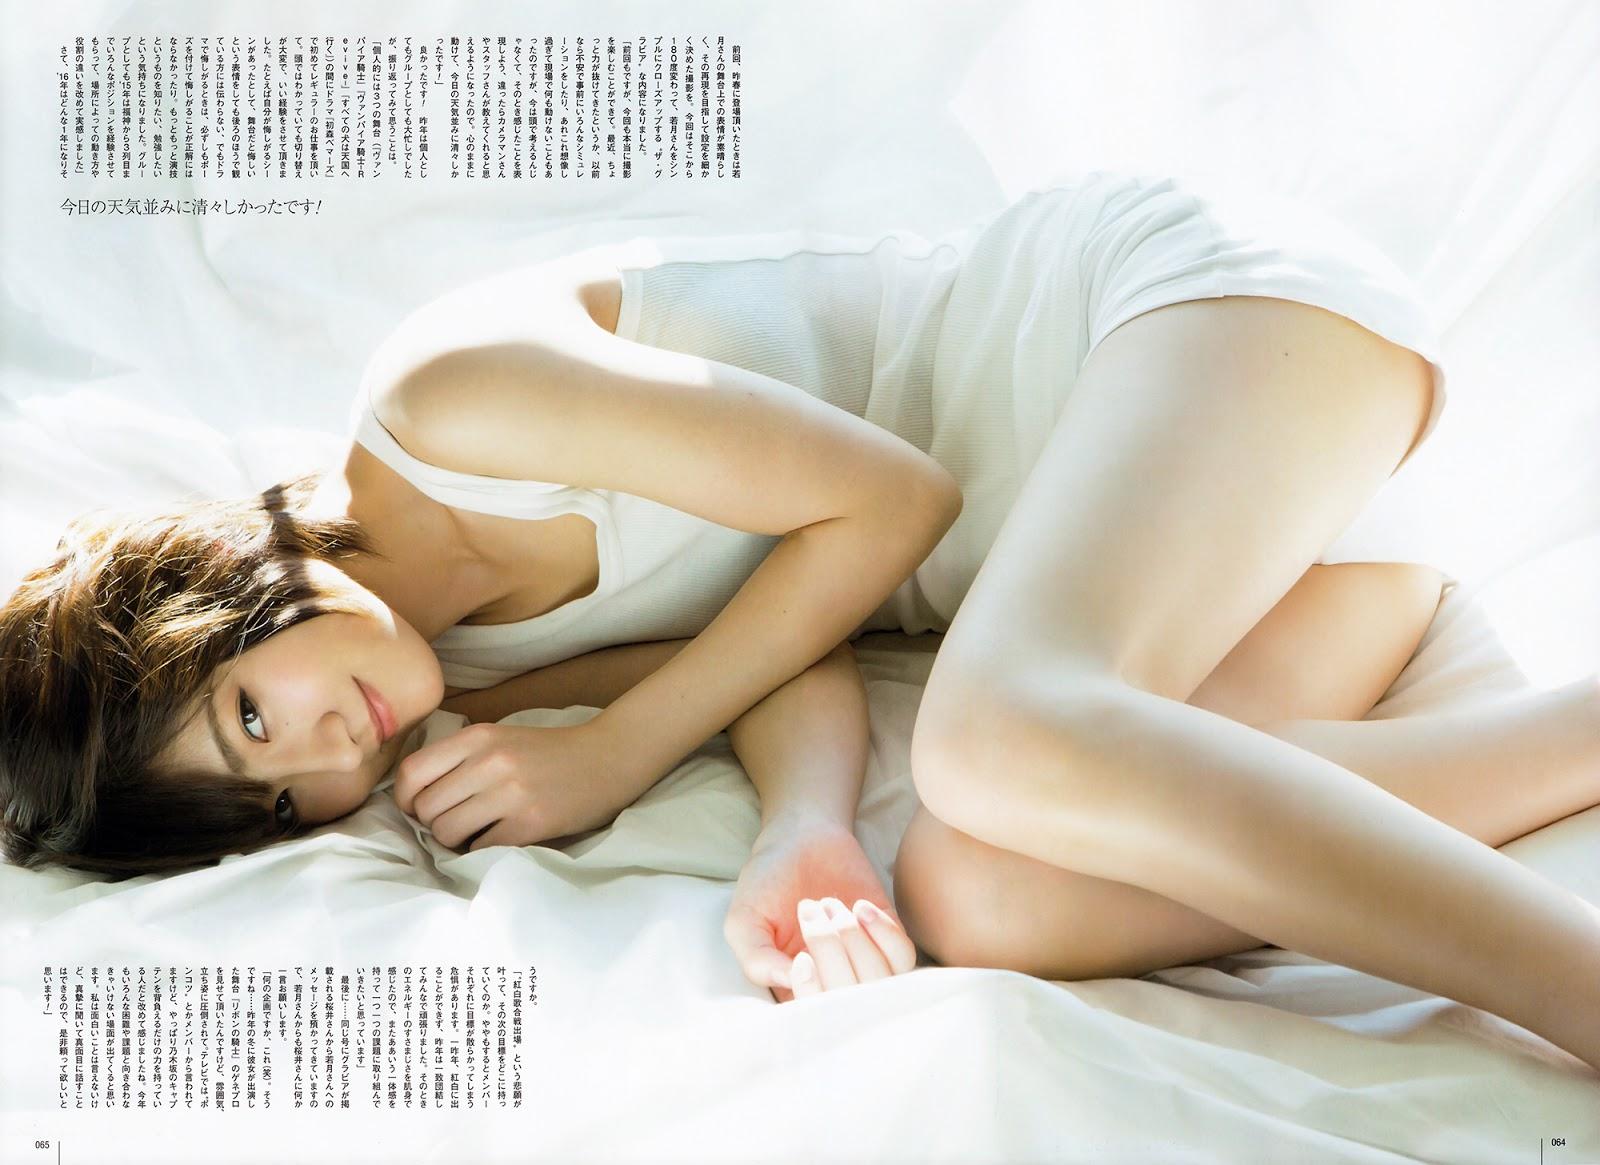 Wakatsuki Yumi 若月佑美 Nogizaka46, UTB Magazine 2016.03 Gravure